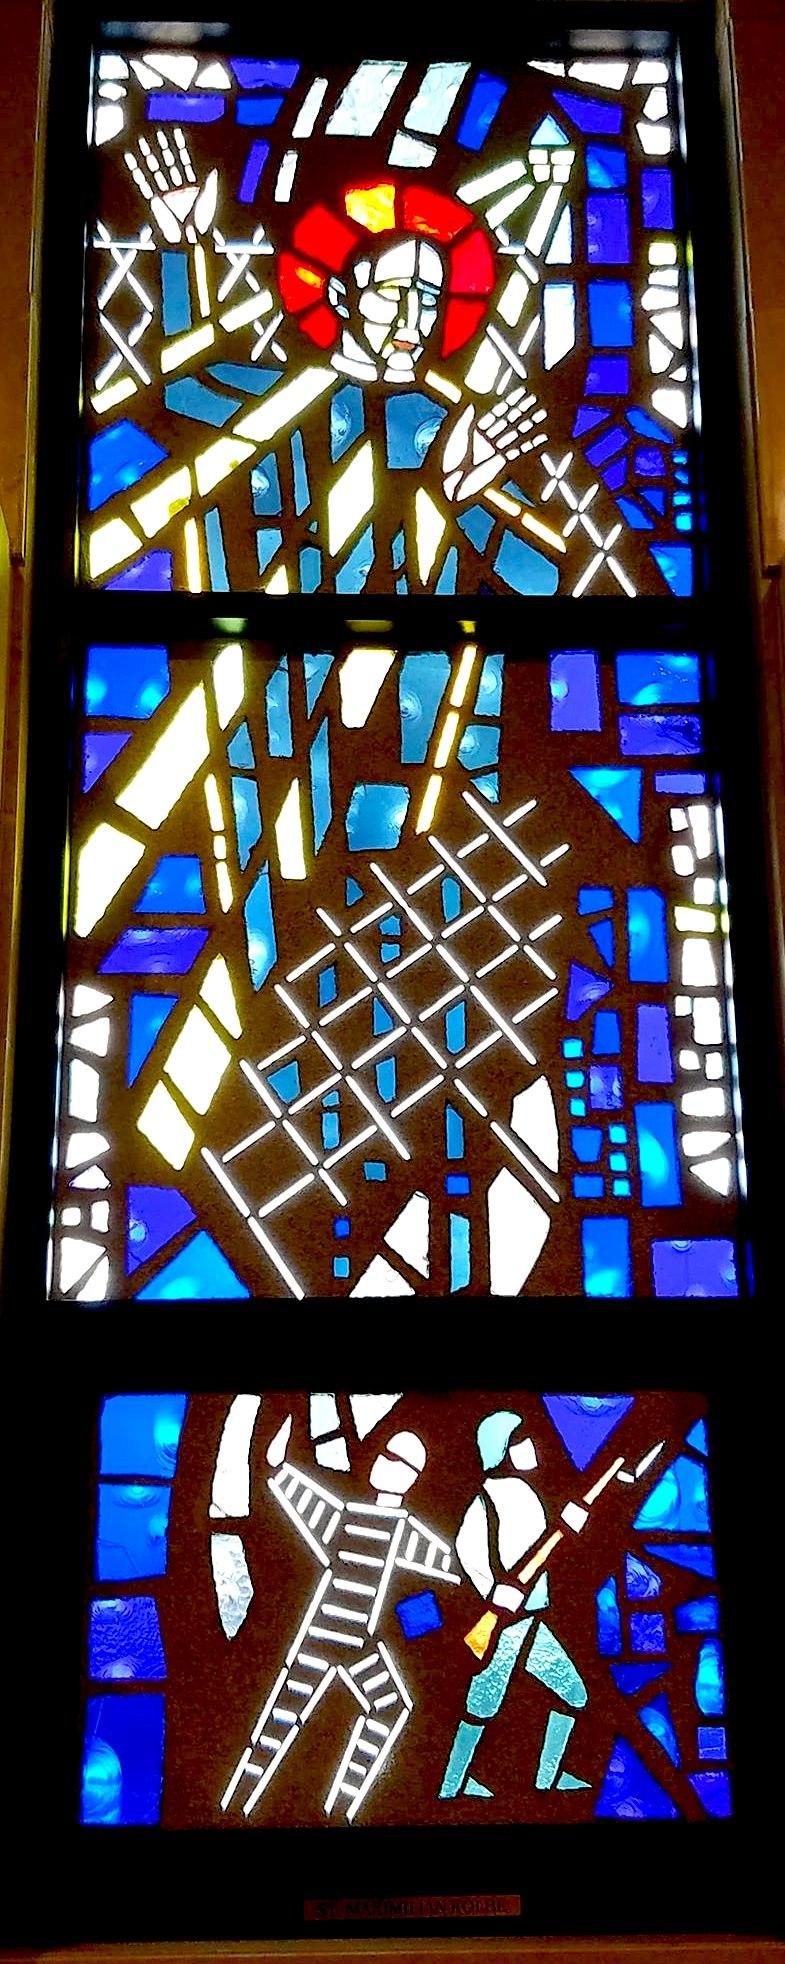 Stained glass commemorating the war dead, Community Mausoleum of All Saints Cemetery, Des Plaines, Illinois